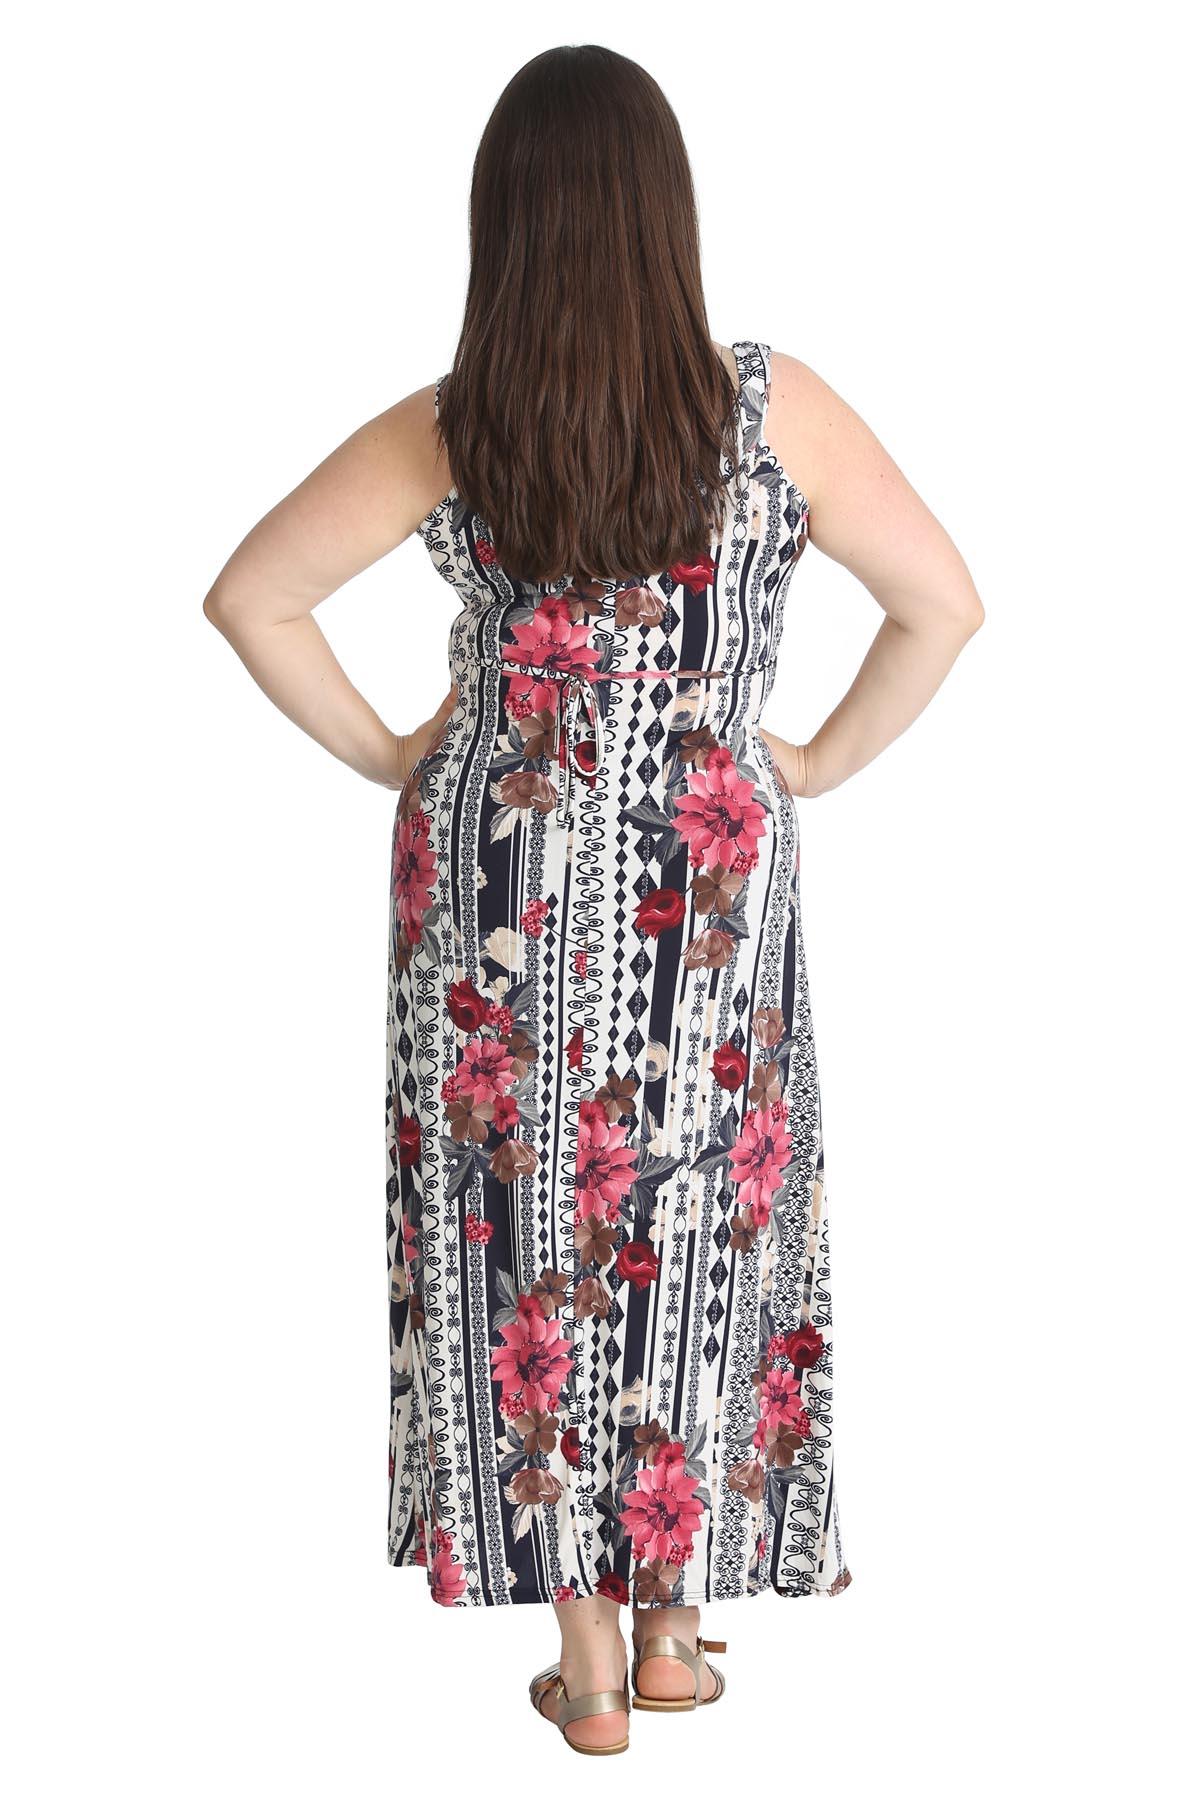 New Ladies Plus Size Maxi Dress Womens Floral Print Full ...